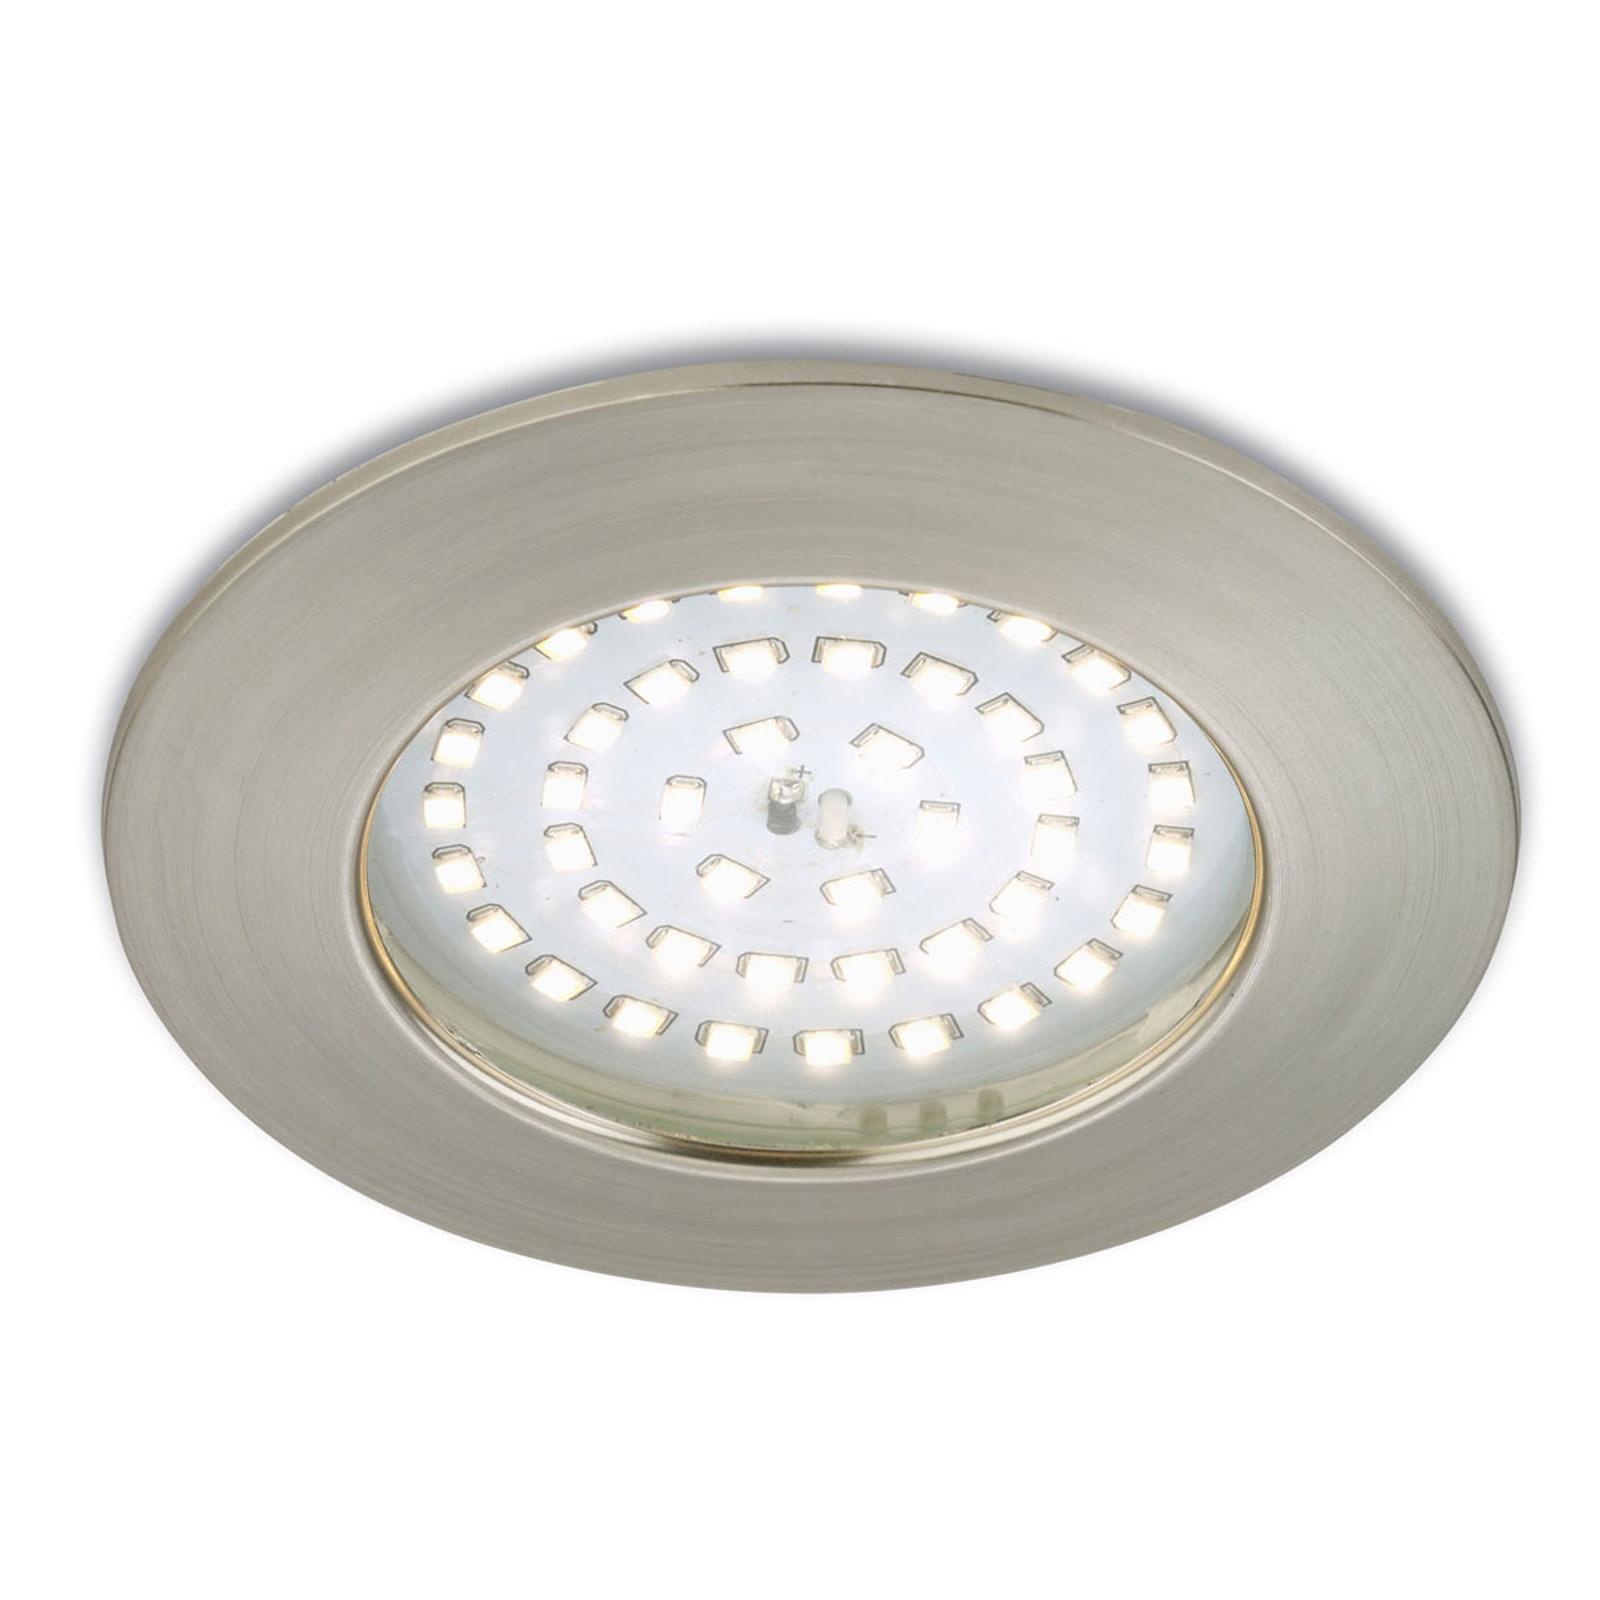 Paul accentuerende LED-indbygningsspot, mat nikkel